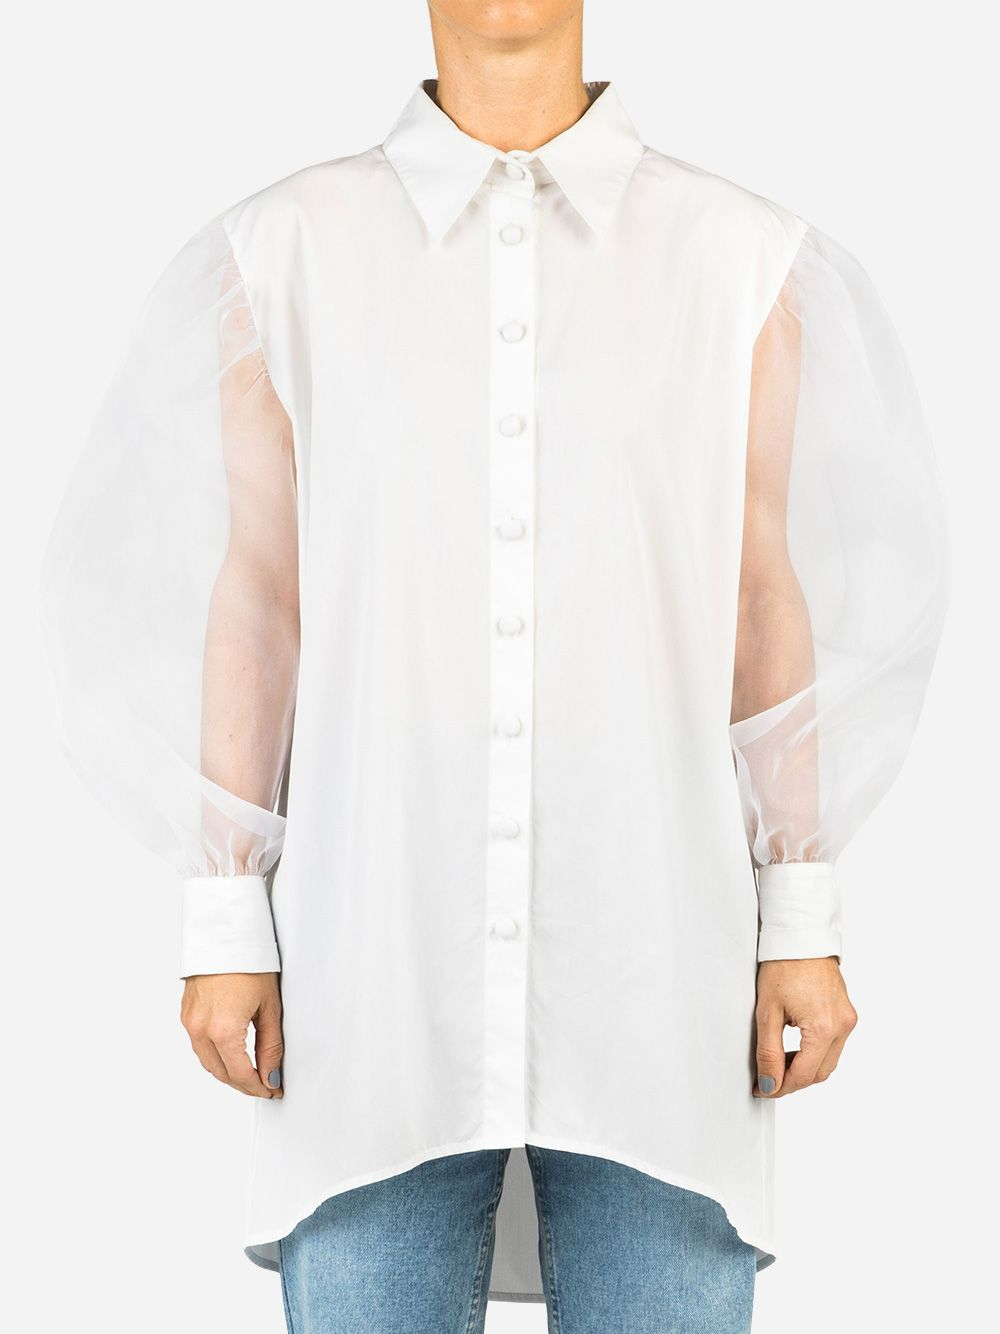 Camisa Organza Misses Daring   Misses White